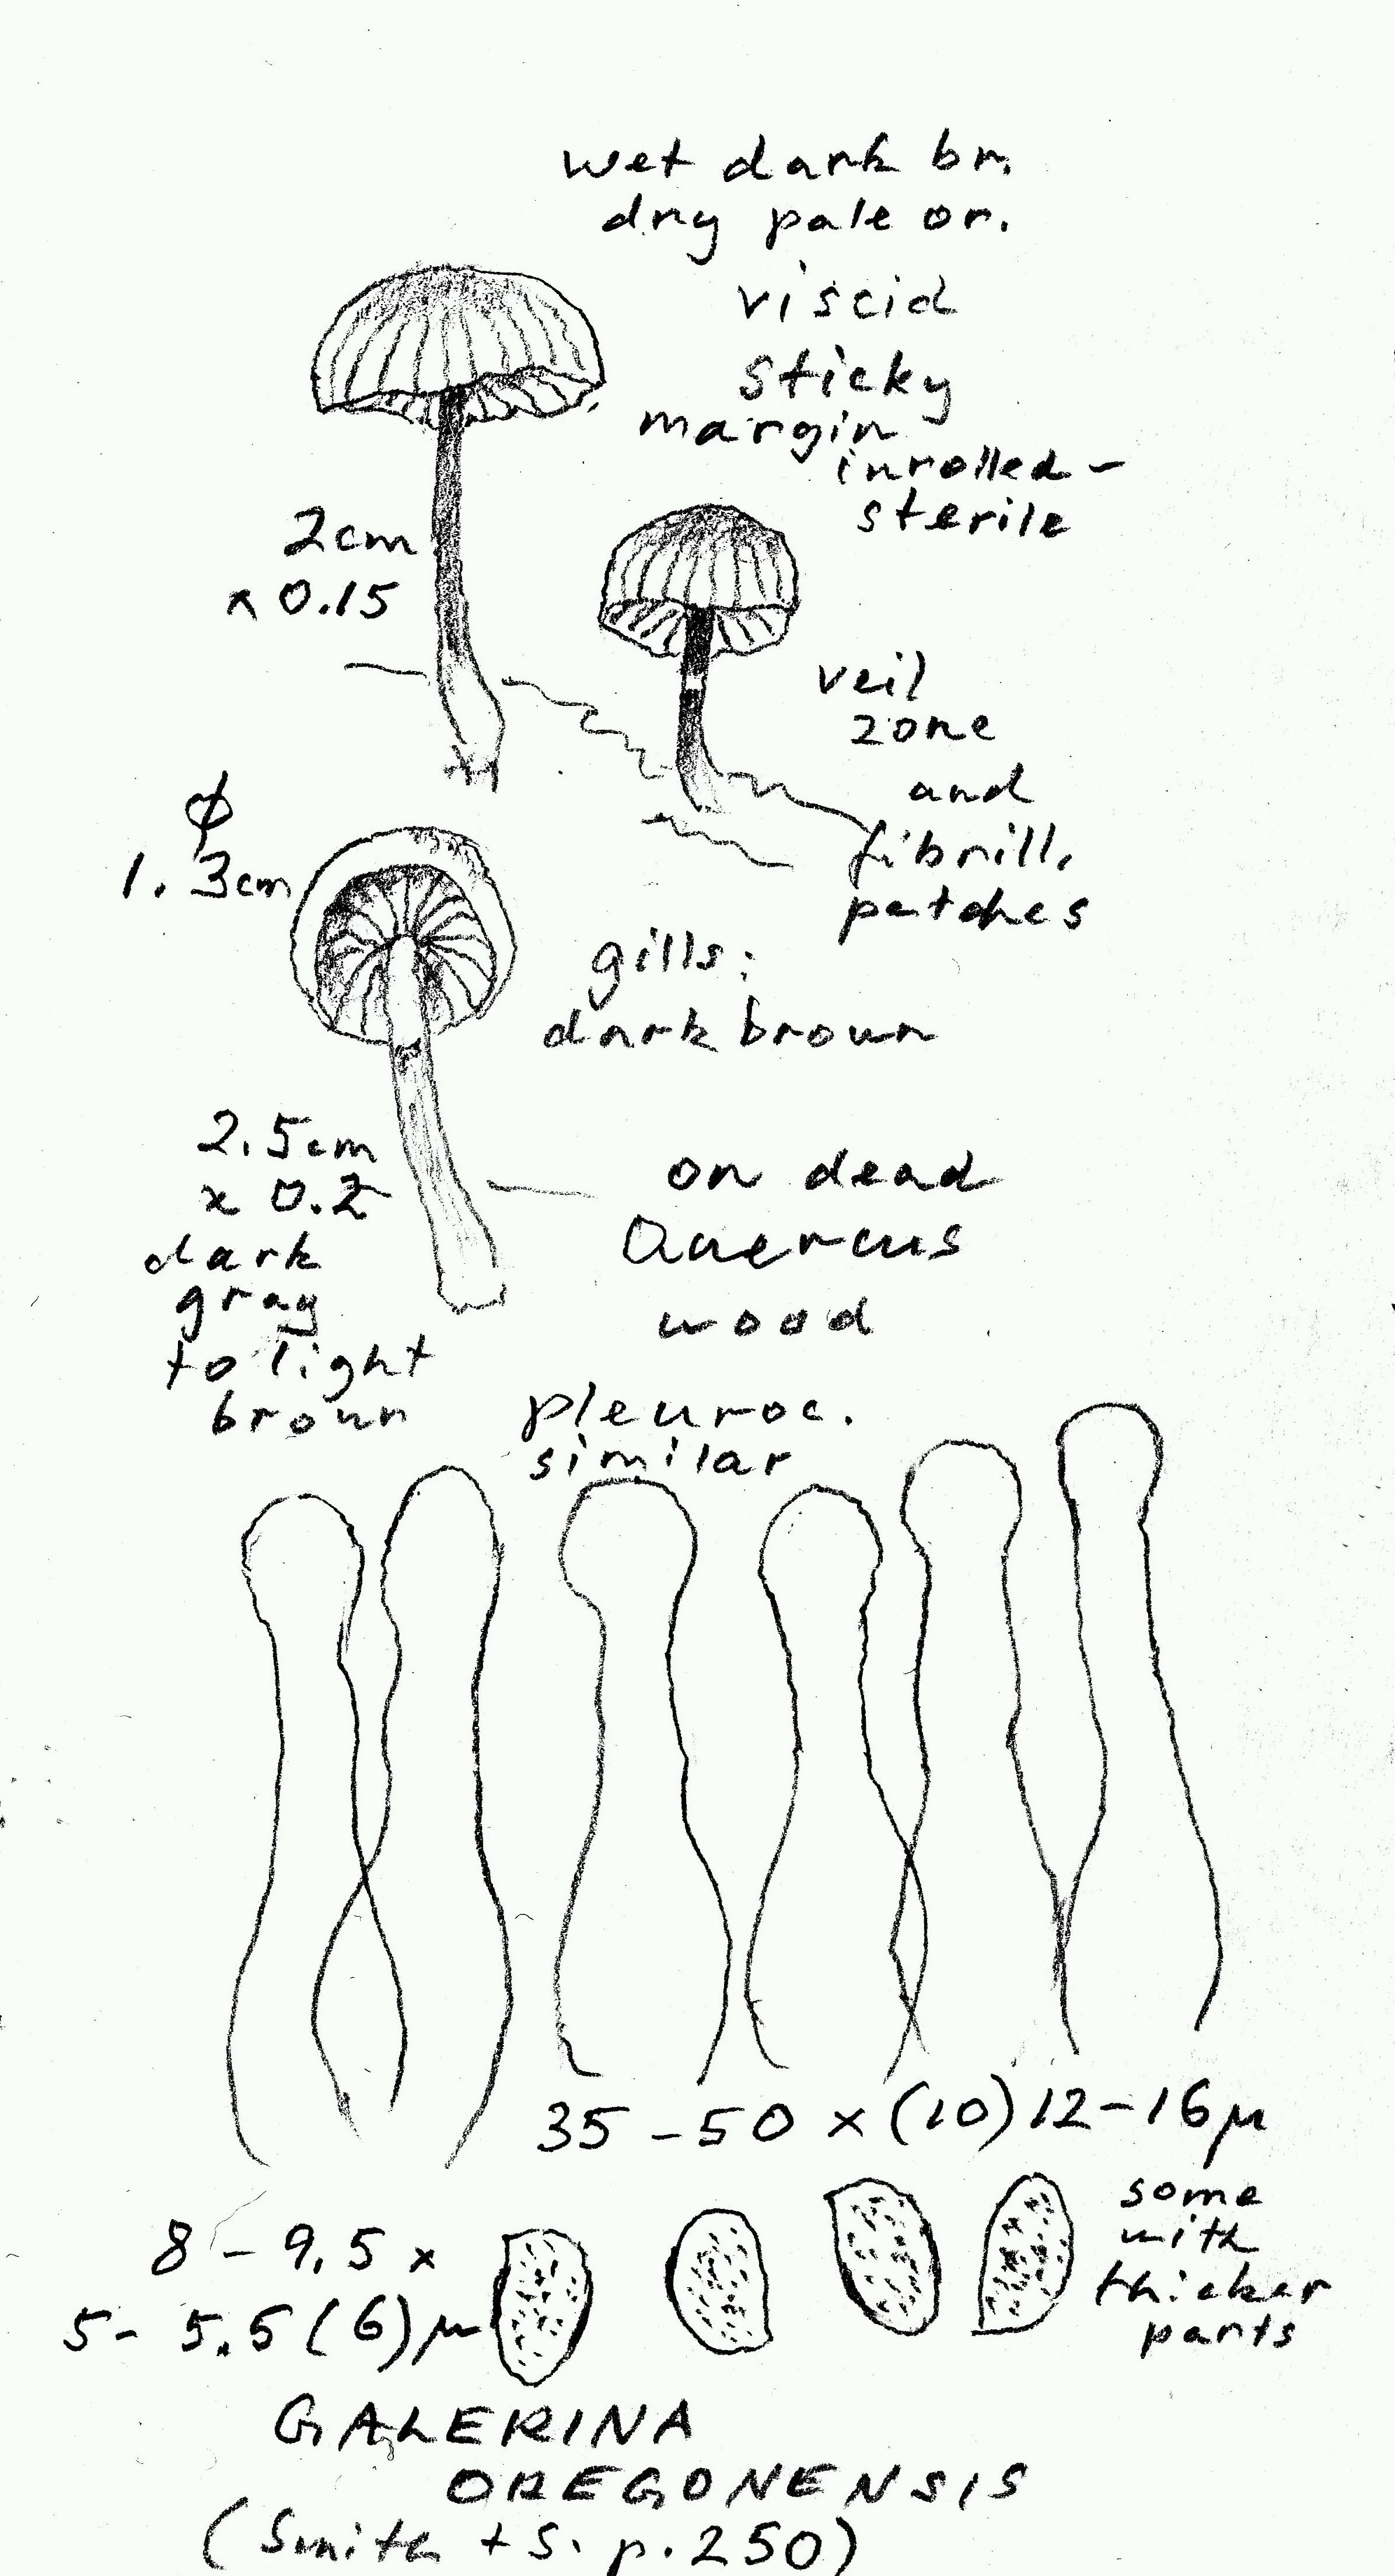 Galerina oregonensis image